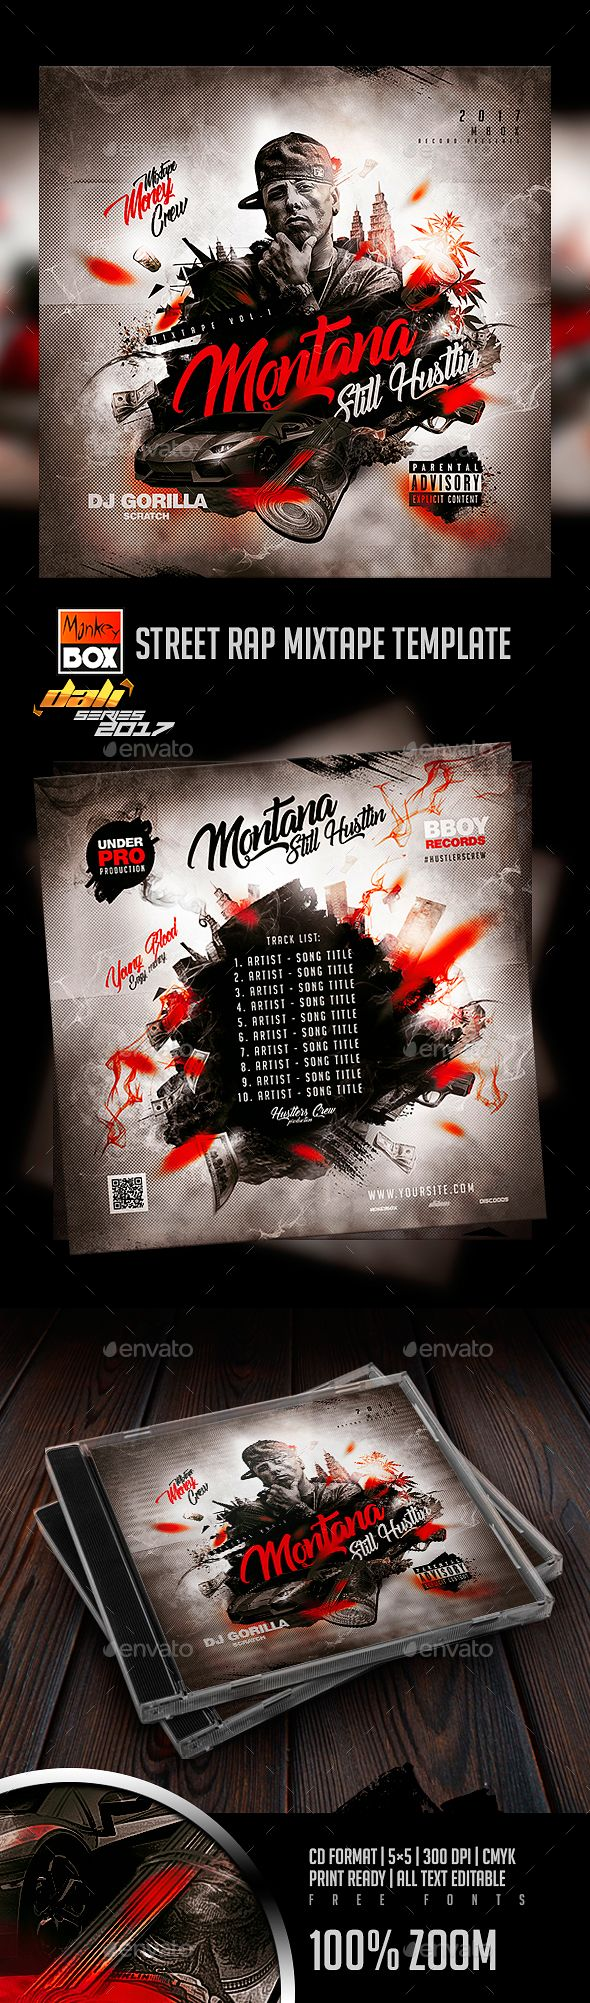 Street Rap Mixtape Template - #CD & DVD Artwork Print Templates